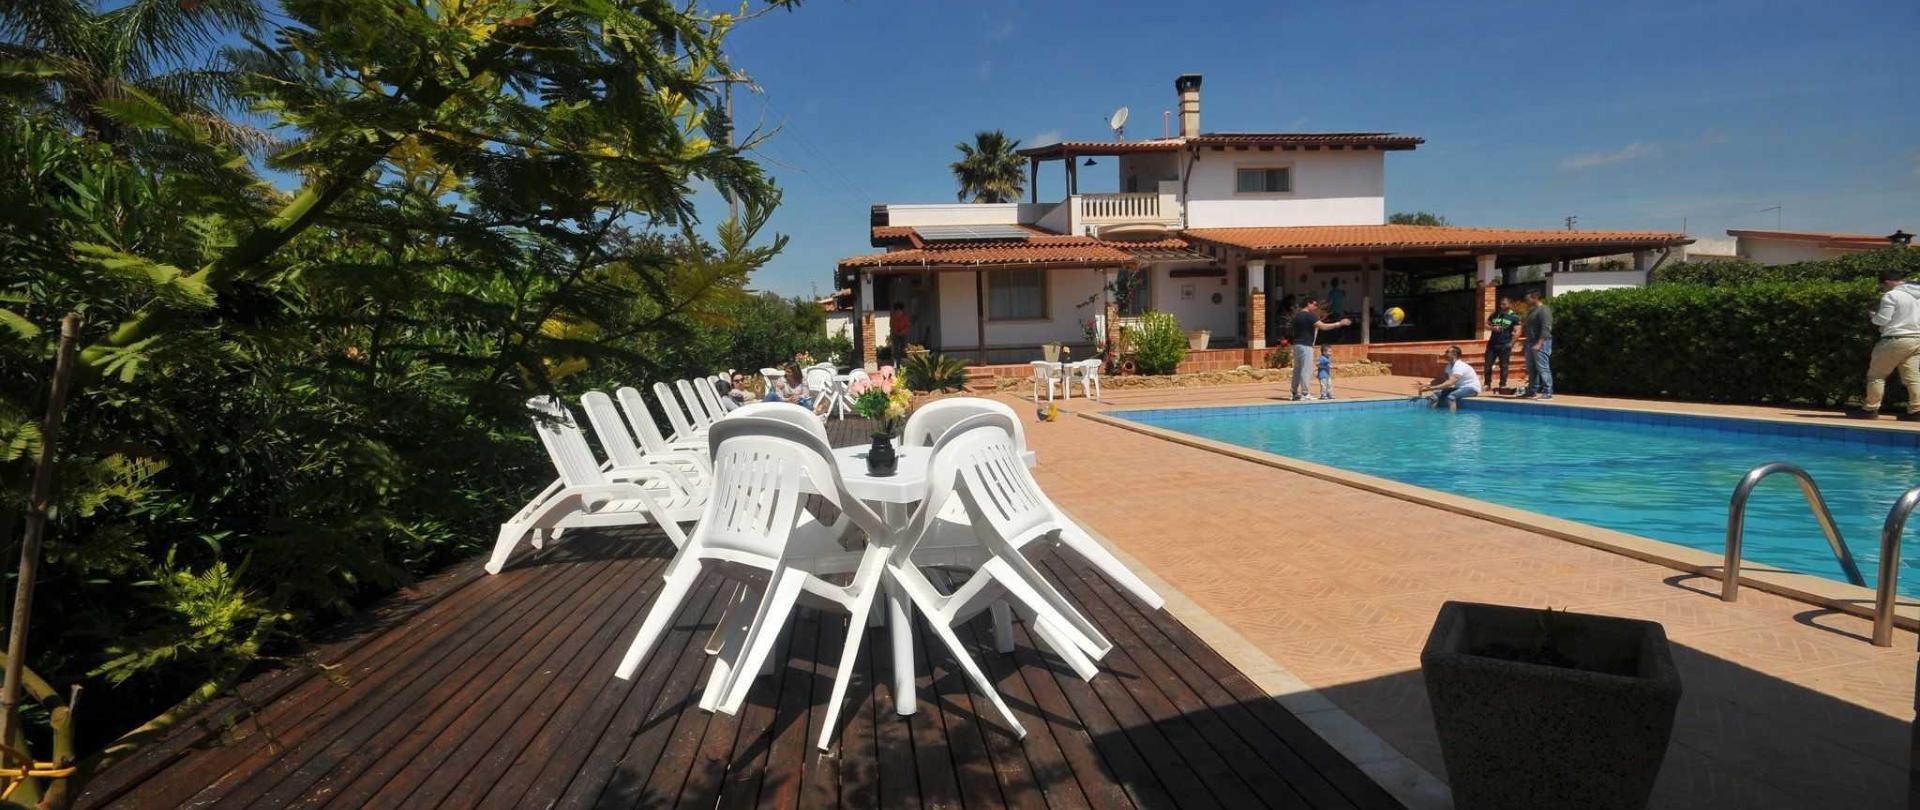 3_resort_noto_il_mandorleto_avola_villa_con_piscina_campagna_siciliana_20.JPG